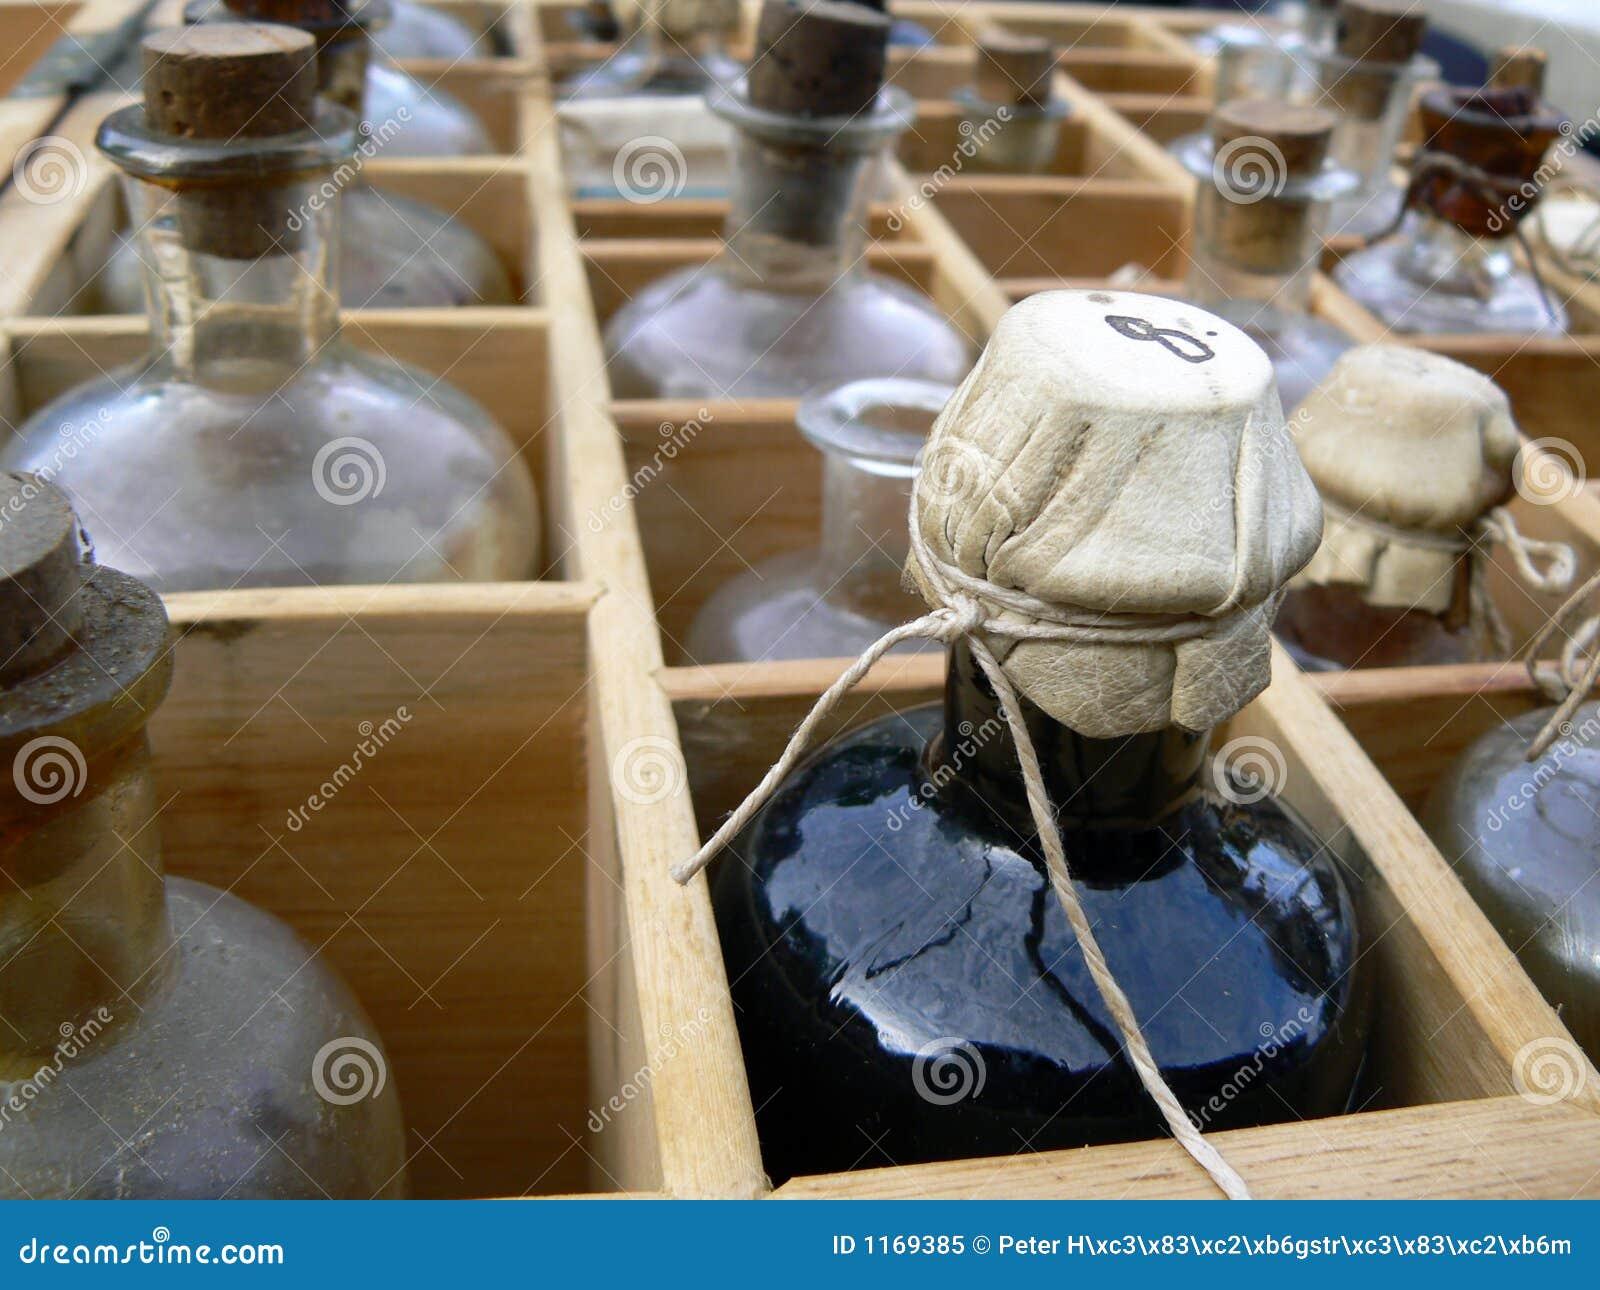 alte medizinflaschen stockbild bild von alcohol getr nk 1169385. Black Bedroom Furniture Sets. Home Design Ideas